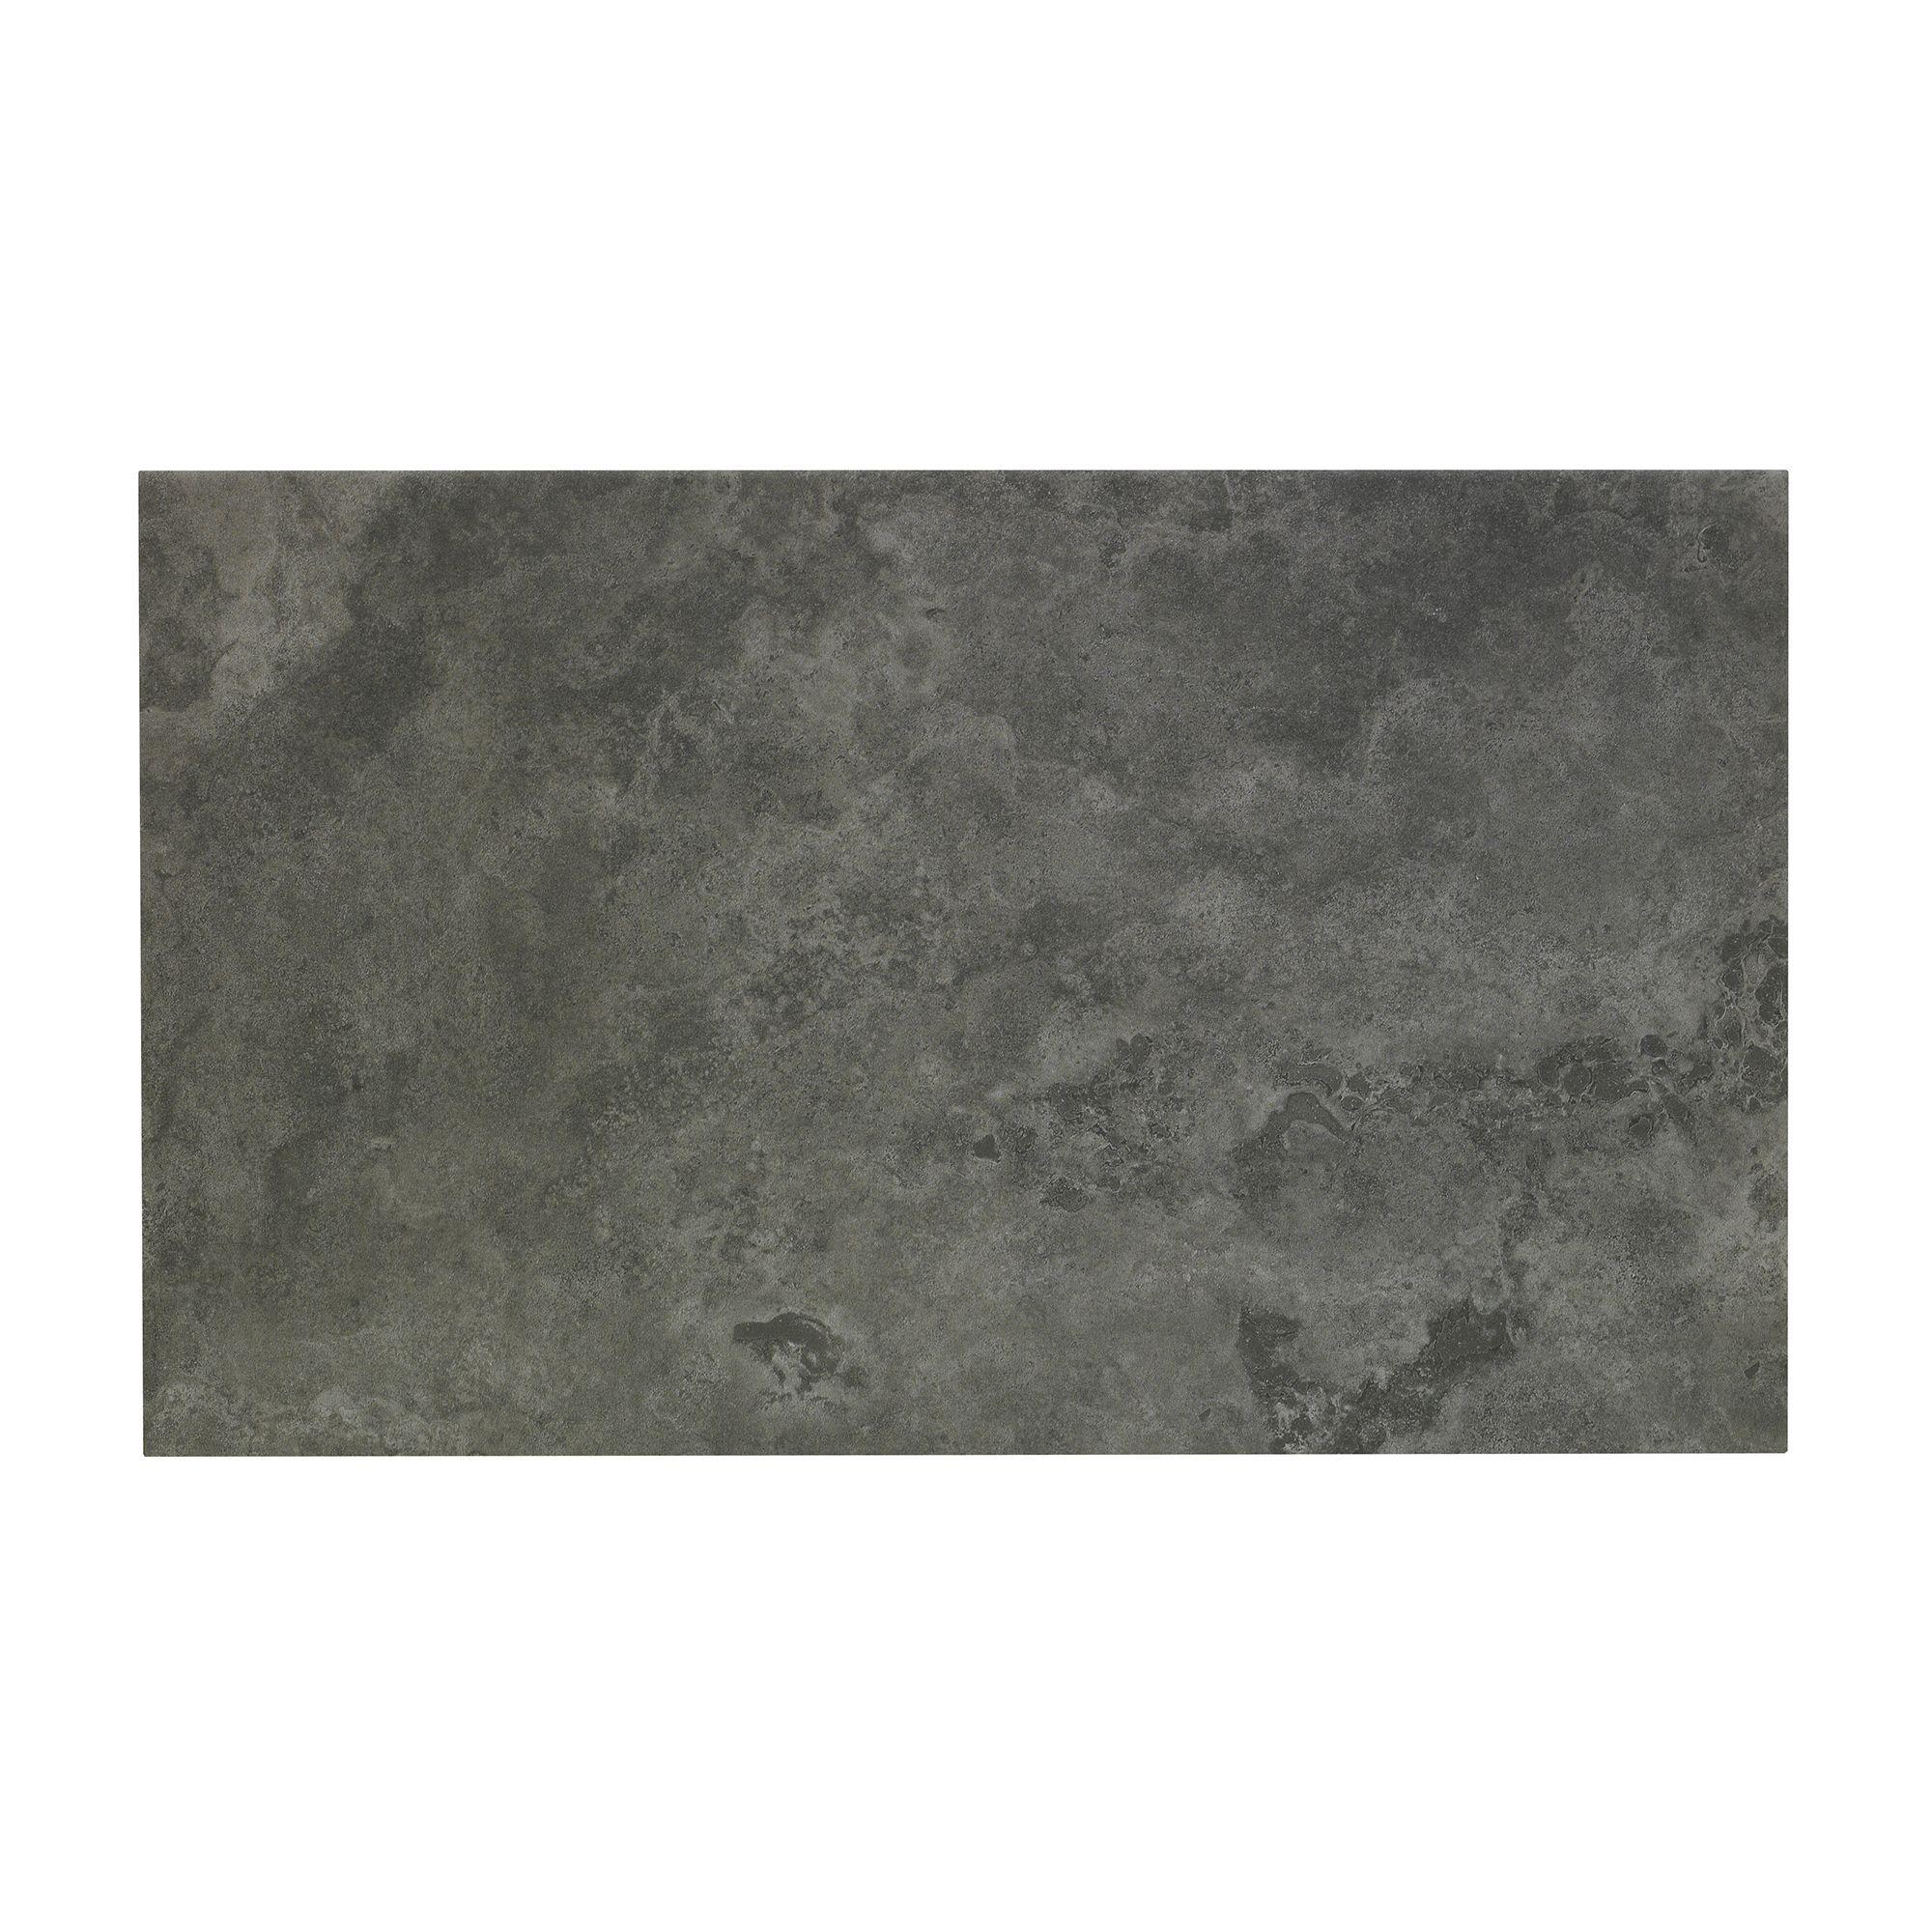 Oscano graphite stone effect ceramic wall floor tile pack of 6 oscano graphite stone effect ceramic wall floor tile pack of 6 l498mm w298mm departments diy at bq dailygadgetfo Gallery